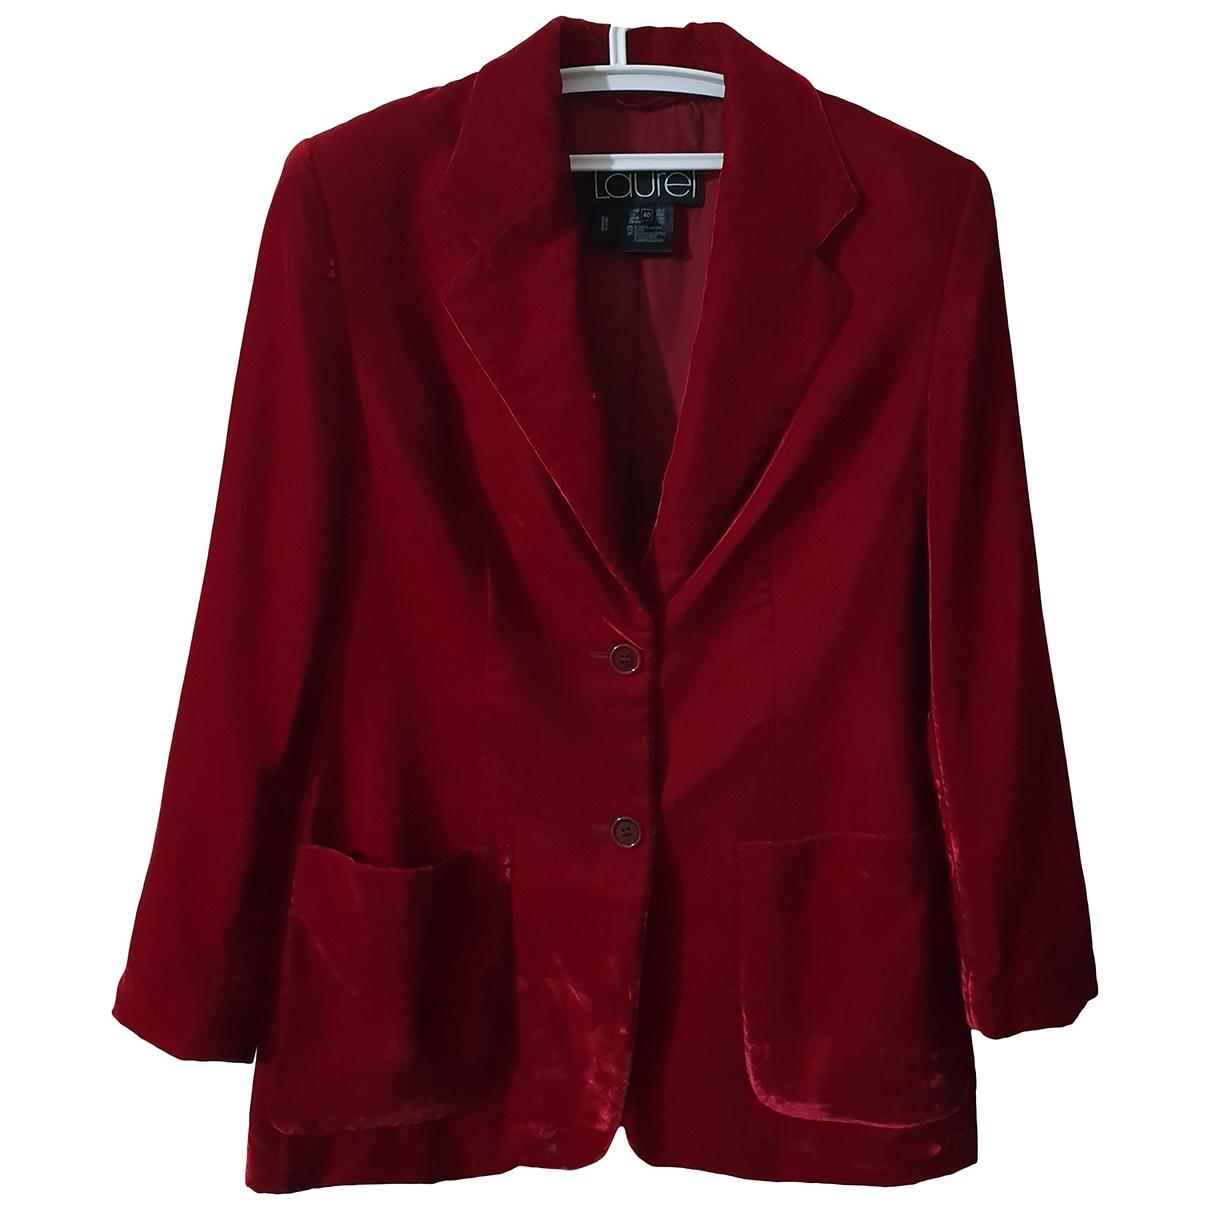 Laurel \N Red jacket for Women XL International